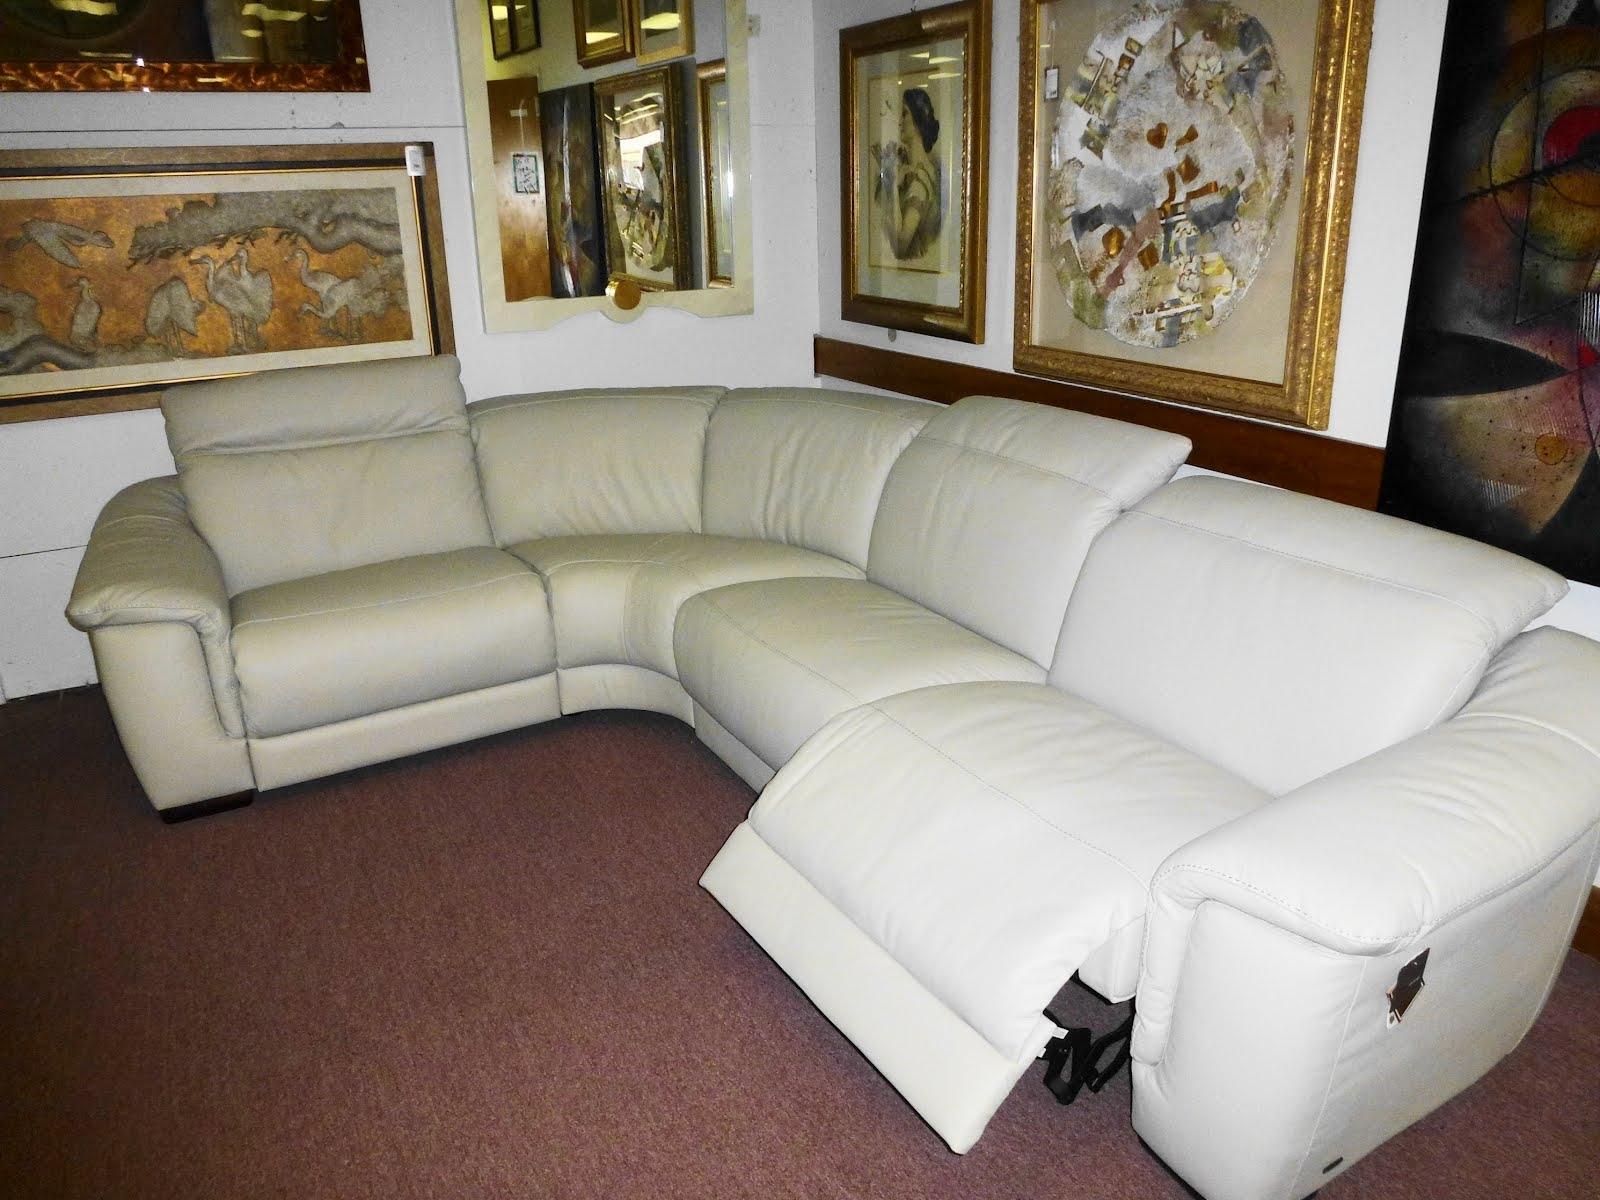 75 Wonderful Sams Club Sofa Home Design | Hoozoo Intended For Sams Club Sectional Sofas (Photo 8 of 10)